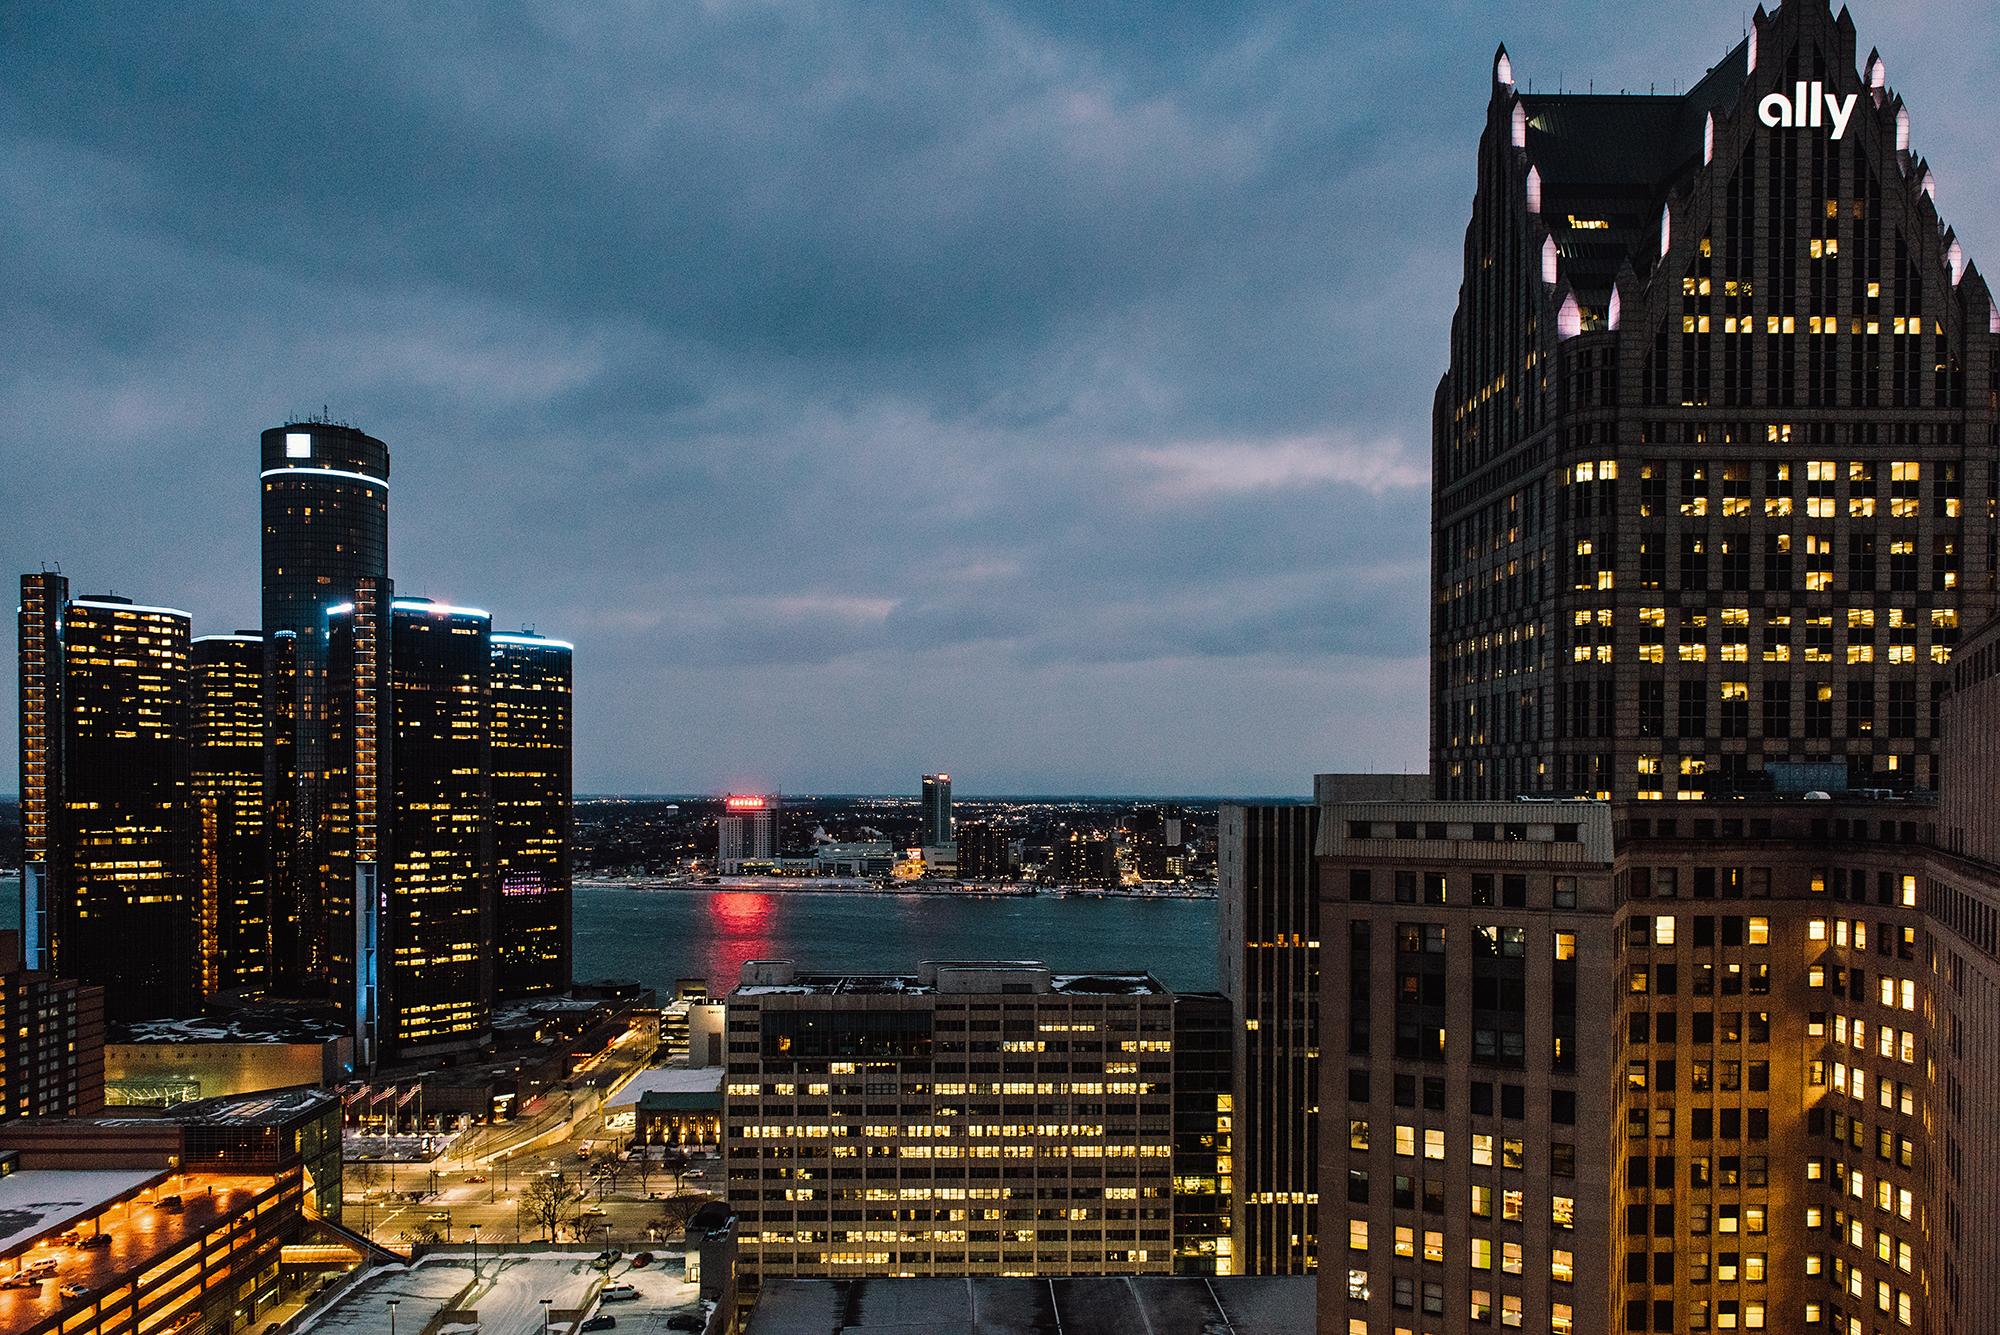 detroit: windsor; michigan; river; skyline; casino; rencen; photographer; andrew potter; drone; sky; photos